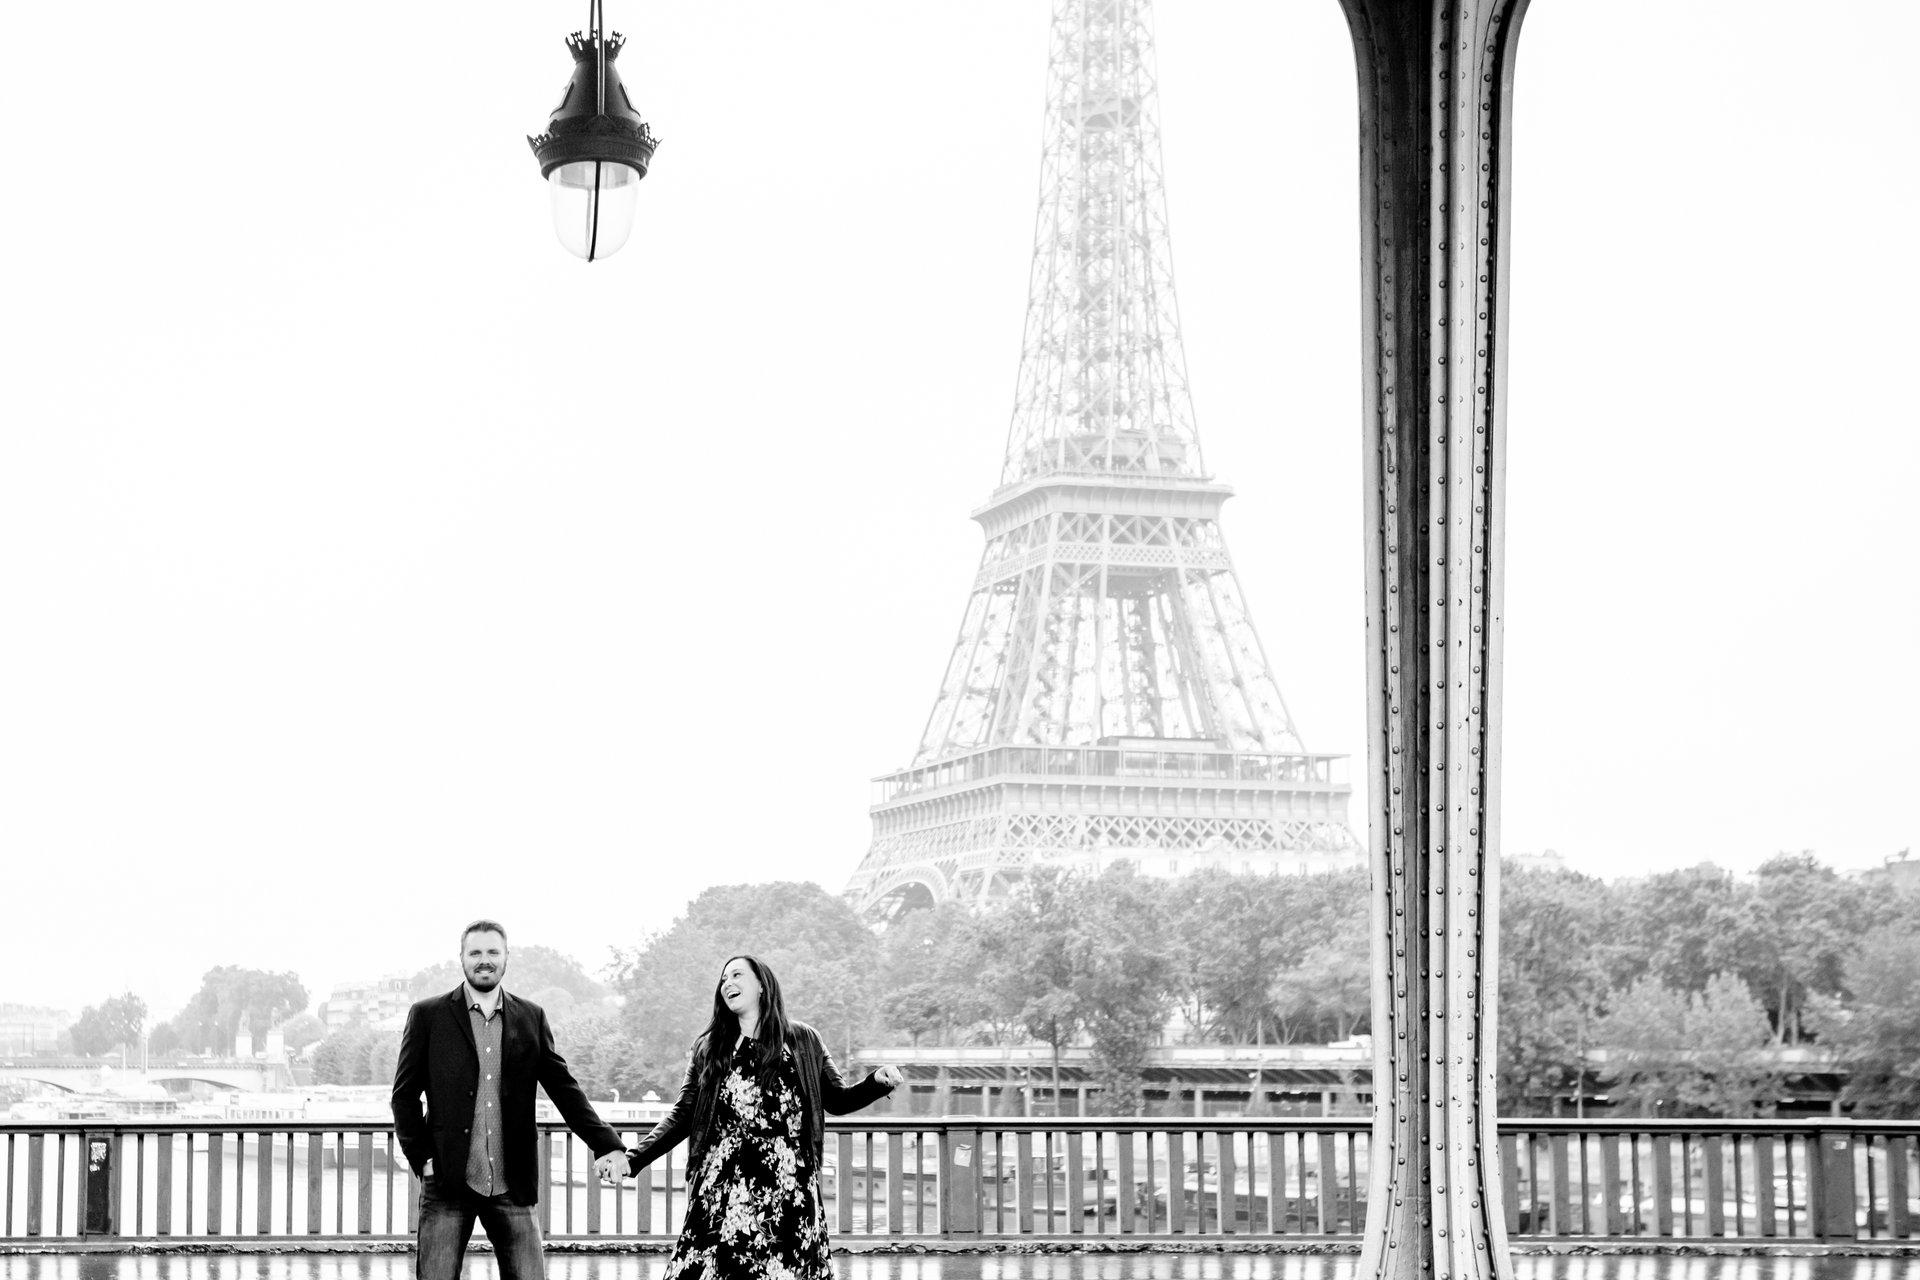 Paris-France-travel-story-Flytographer-9